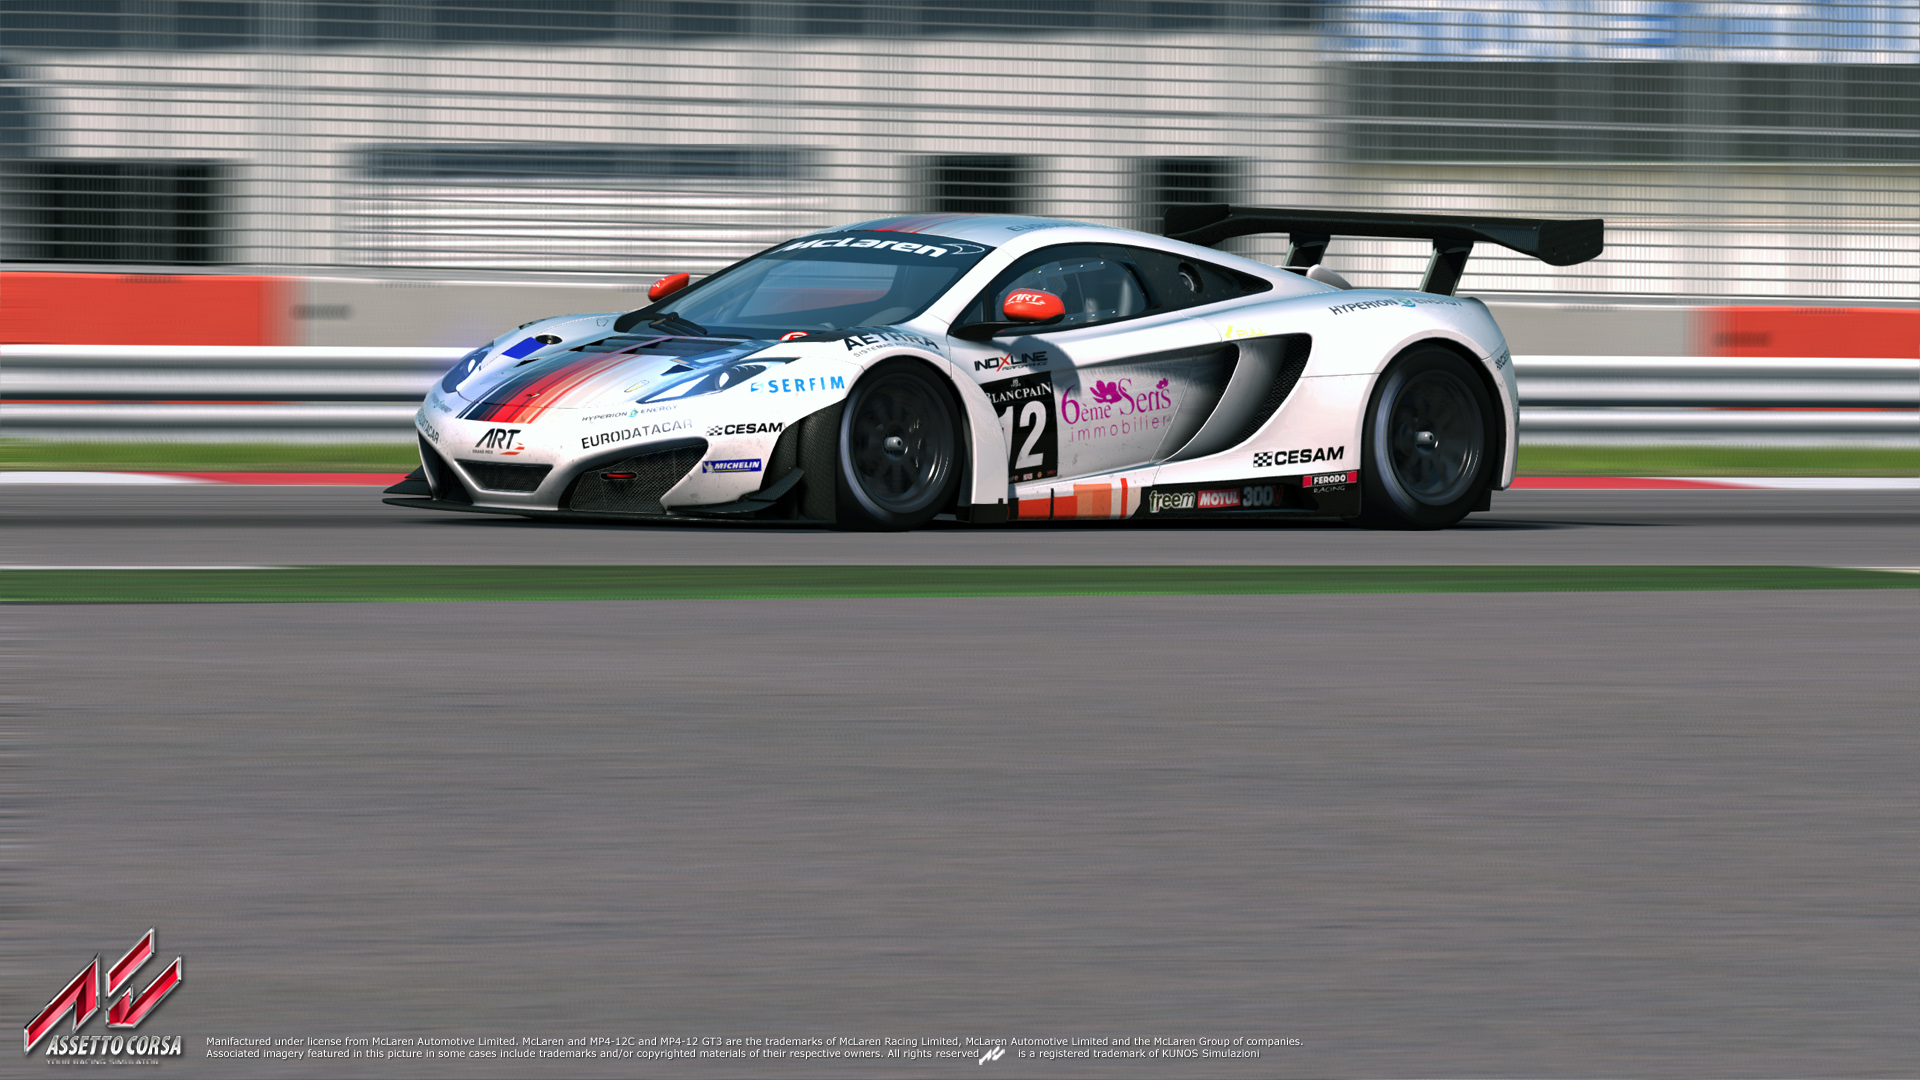 Assetto Corsa: Egy virtuális orgia a McLarennel